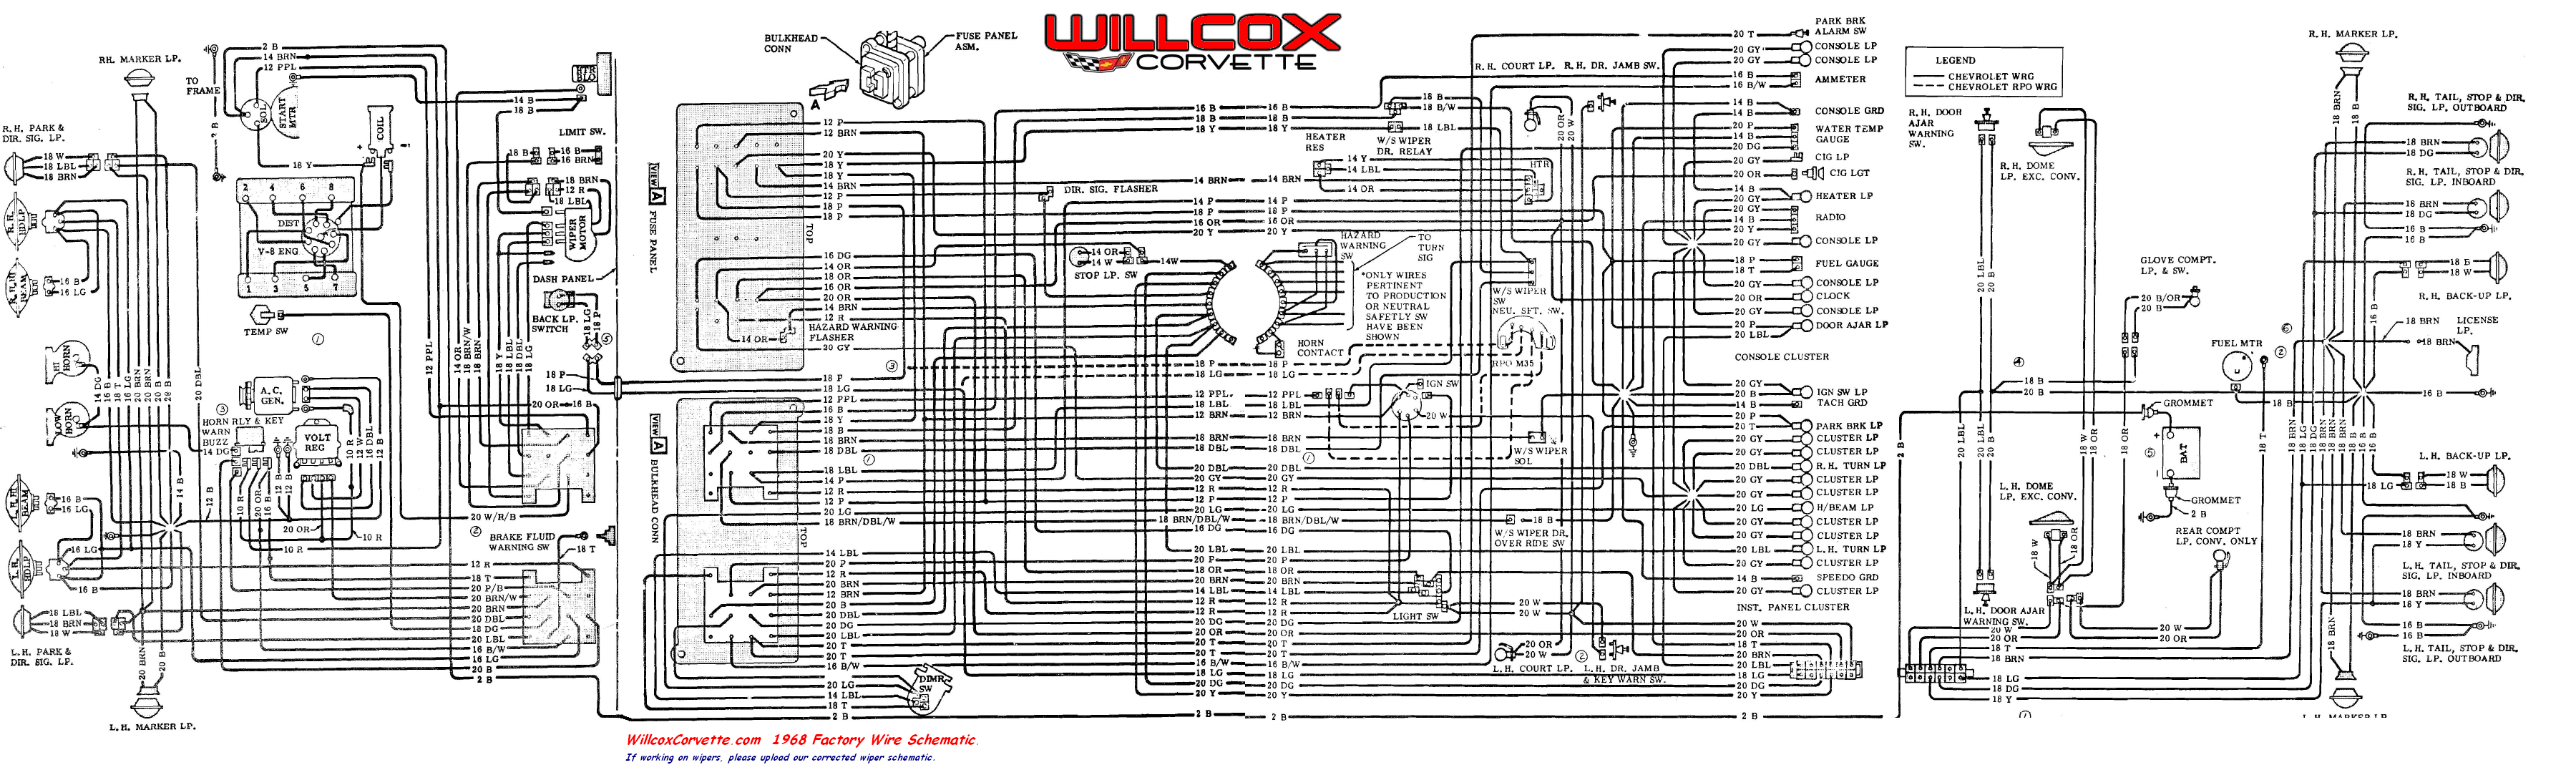 Fine Corvette Wiring Diagrams Wiring Diagram Database Wiring Cloud Intelaidewilluminateatxorg